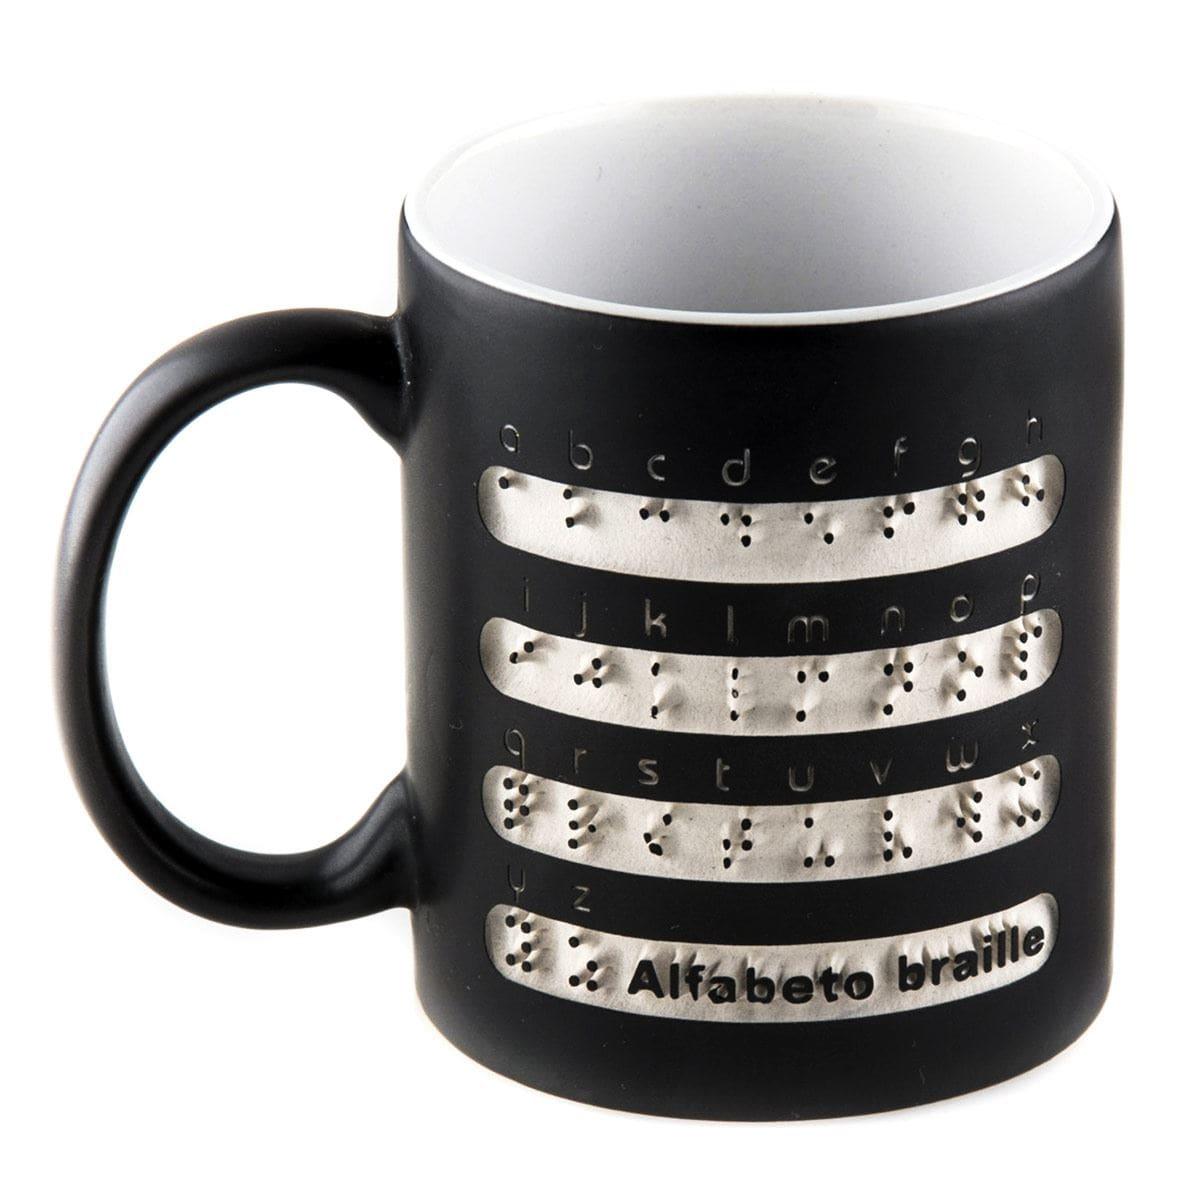 Taza alfabeto braille SG Promocionales